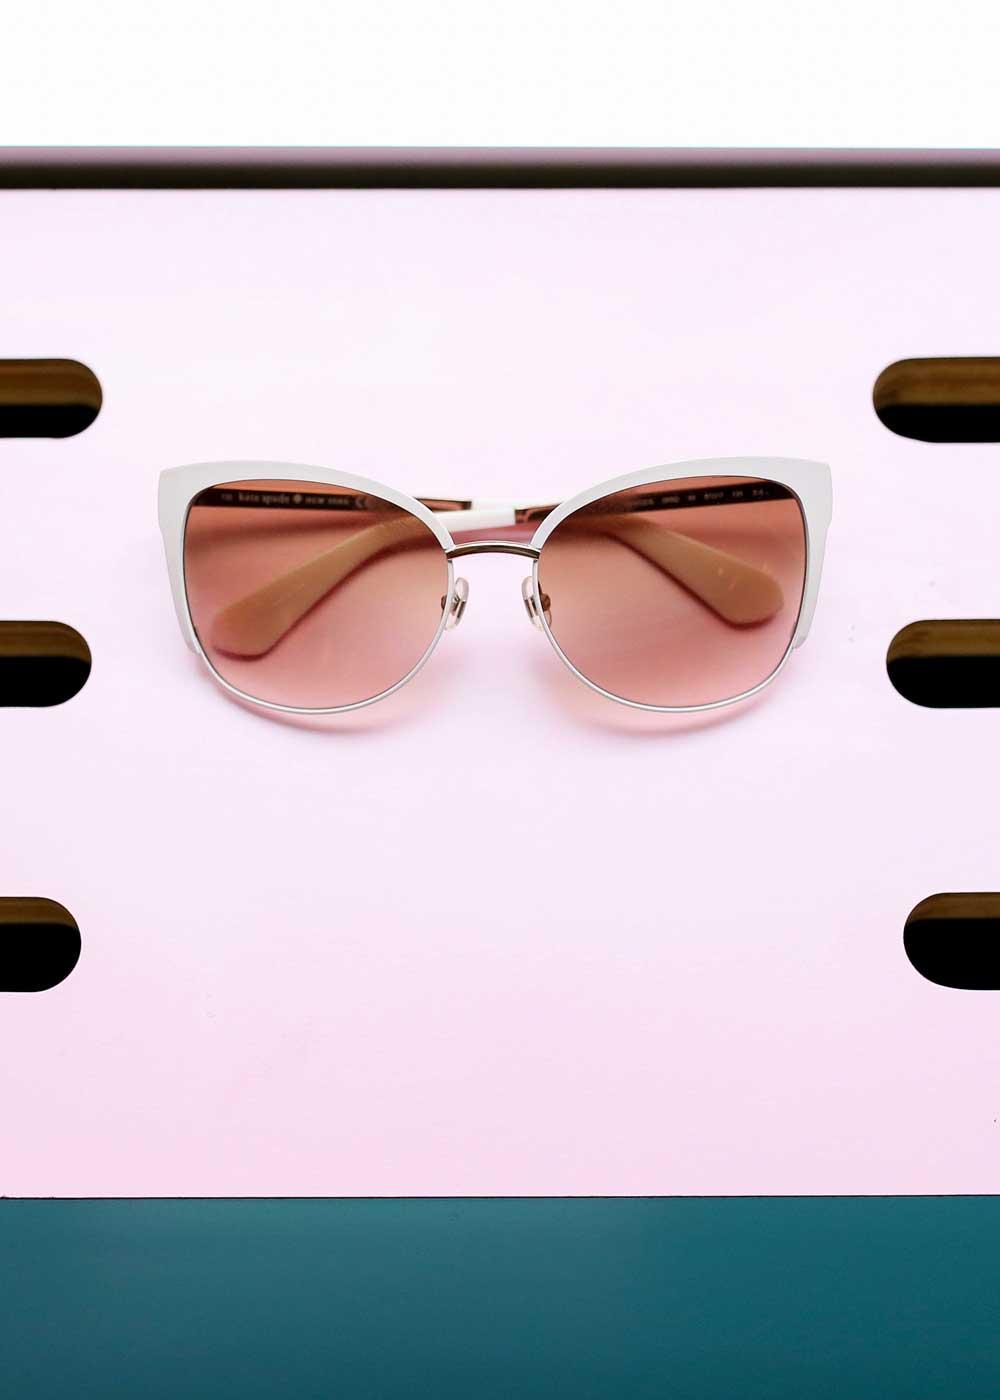 Kate Spade Sunglasses Sale